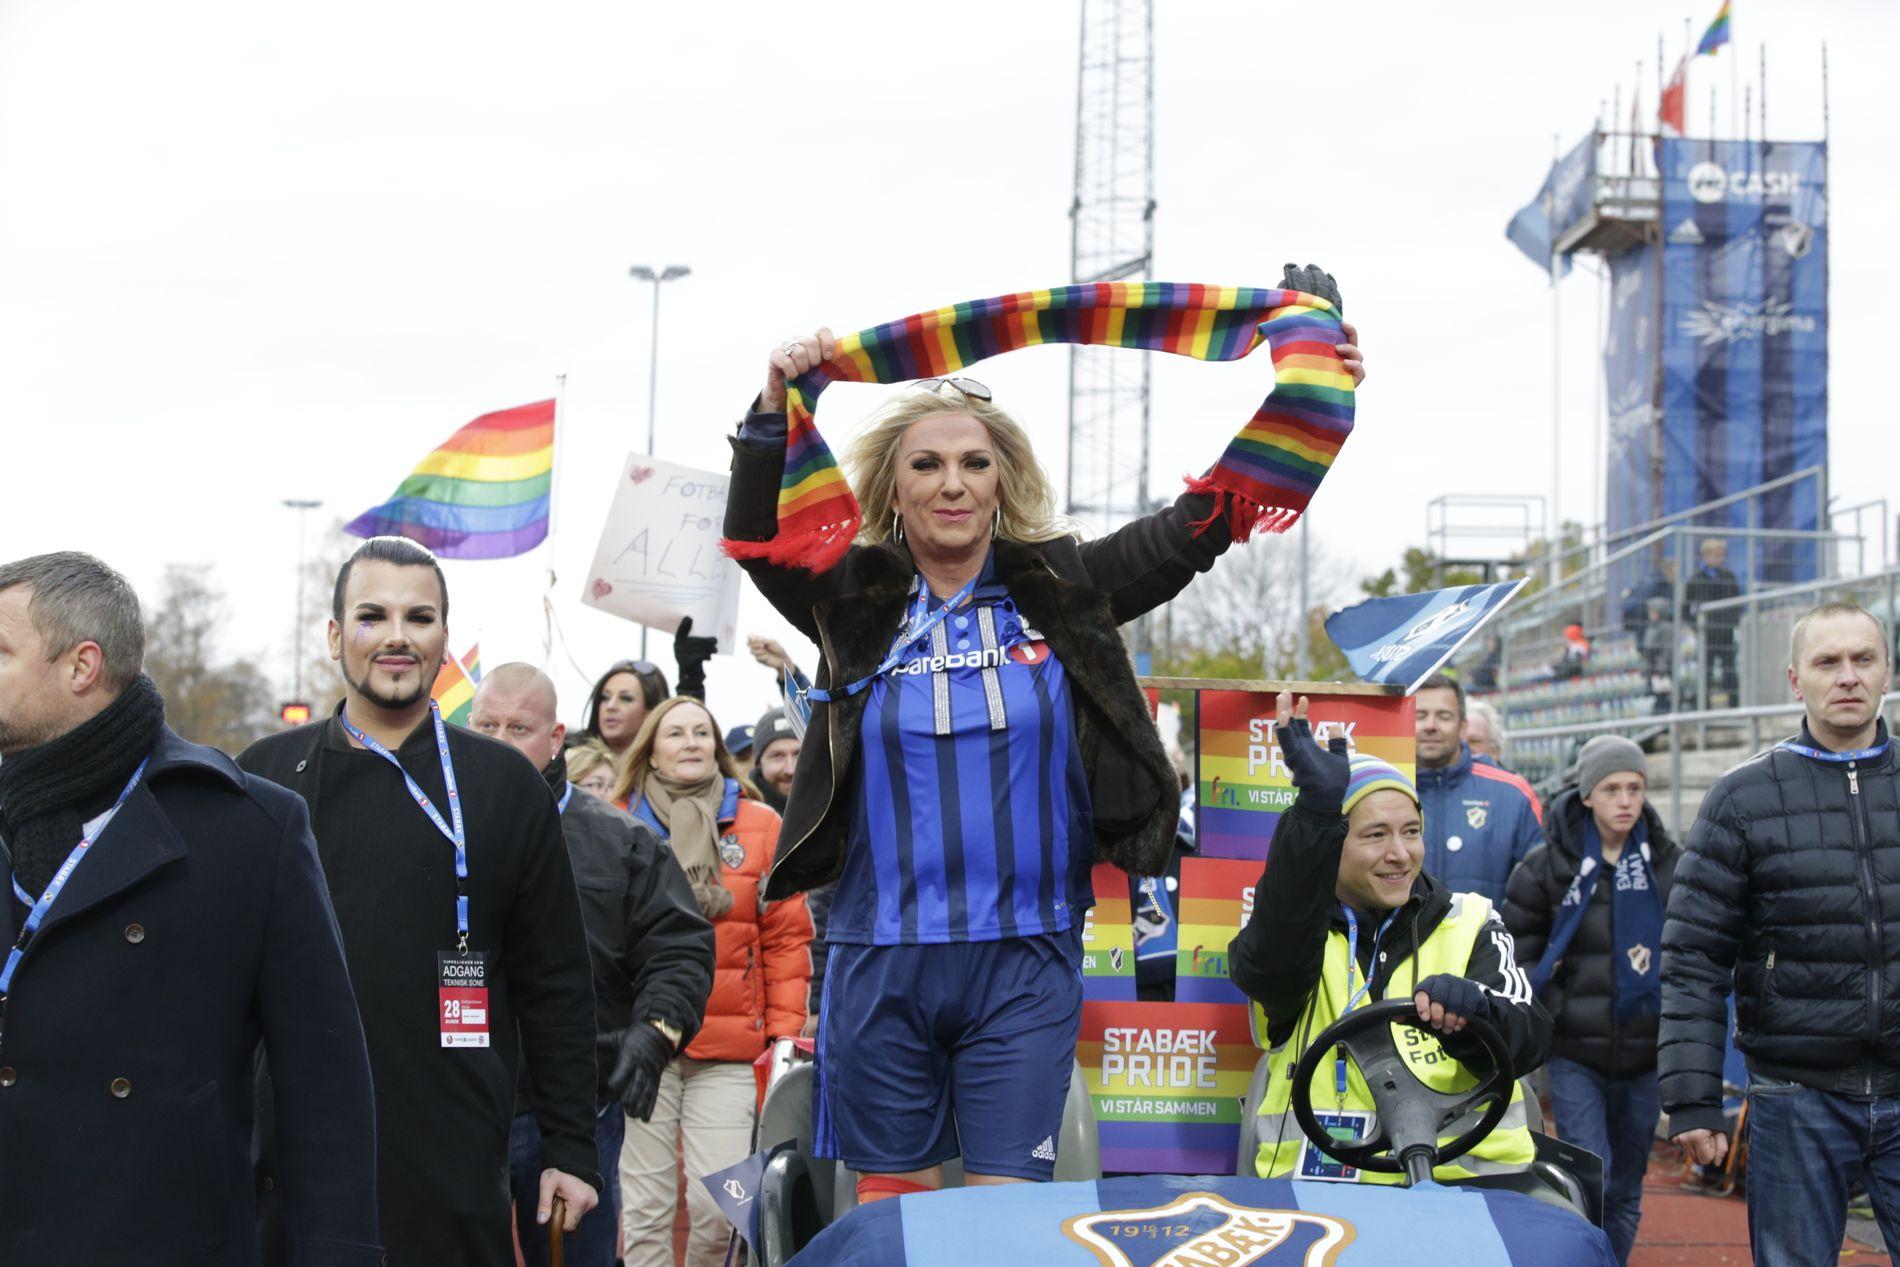 GODT EKSEMPEL: Terje Scrøder og Erlend Bratland (t.v.) frontet Pride-opptoget på Nadderud i 2016, i forkant av Eliteseriekampen mellom Stabæk og Sarpsborg 08.